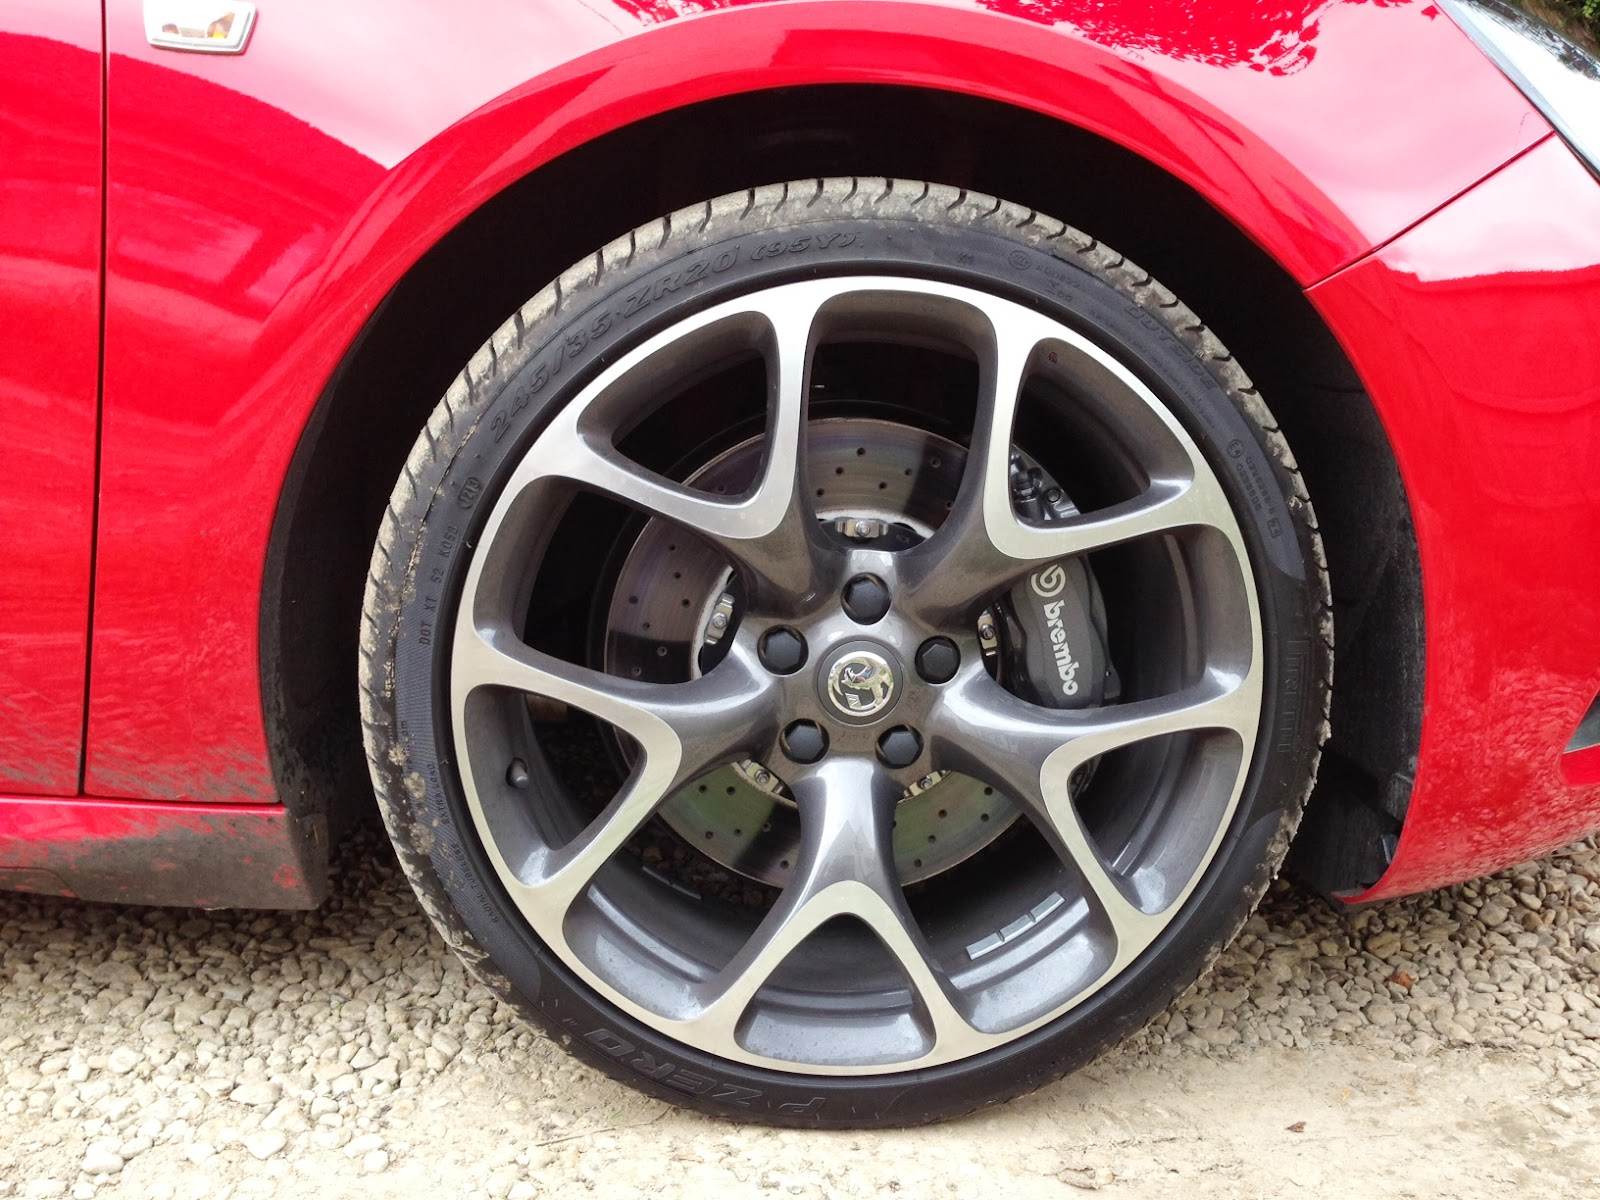 Speedmonkey 2013 Vauxhall Astra Vxr Review